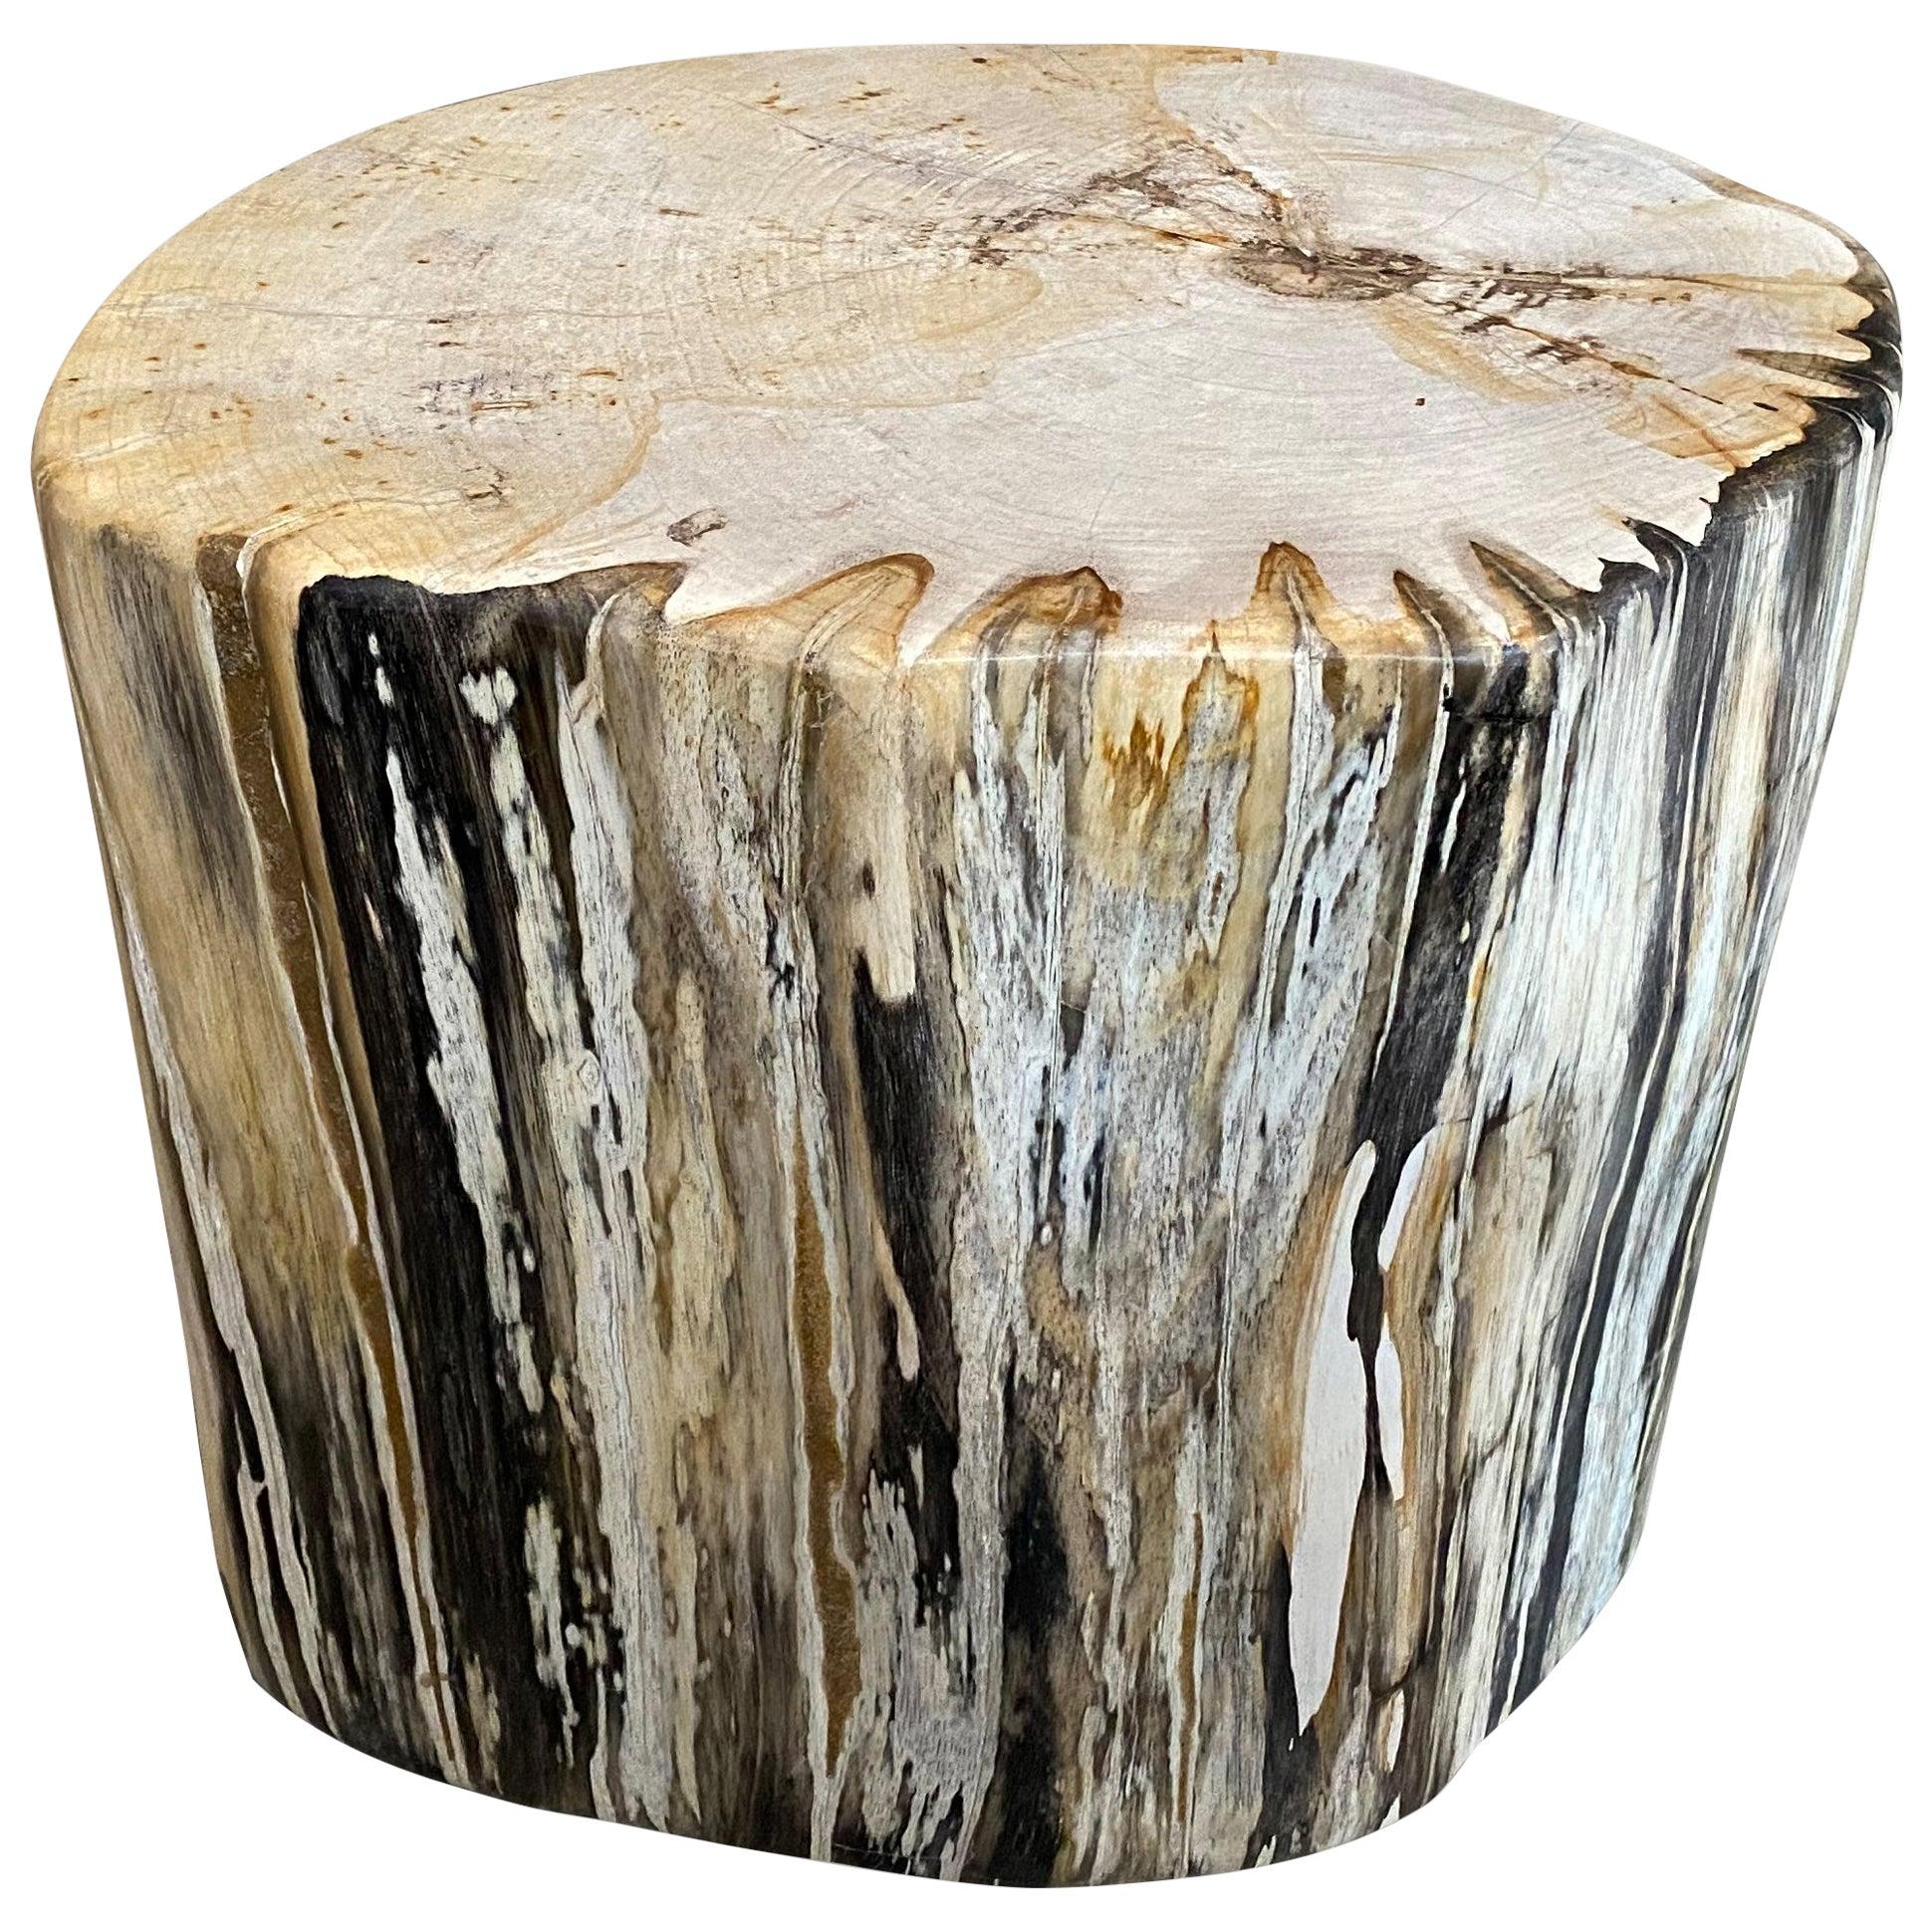 Andrianna Shamaris High Quality Petrified Wood Side Table or Coffee Table